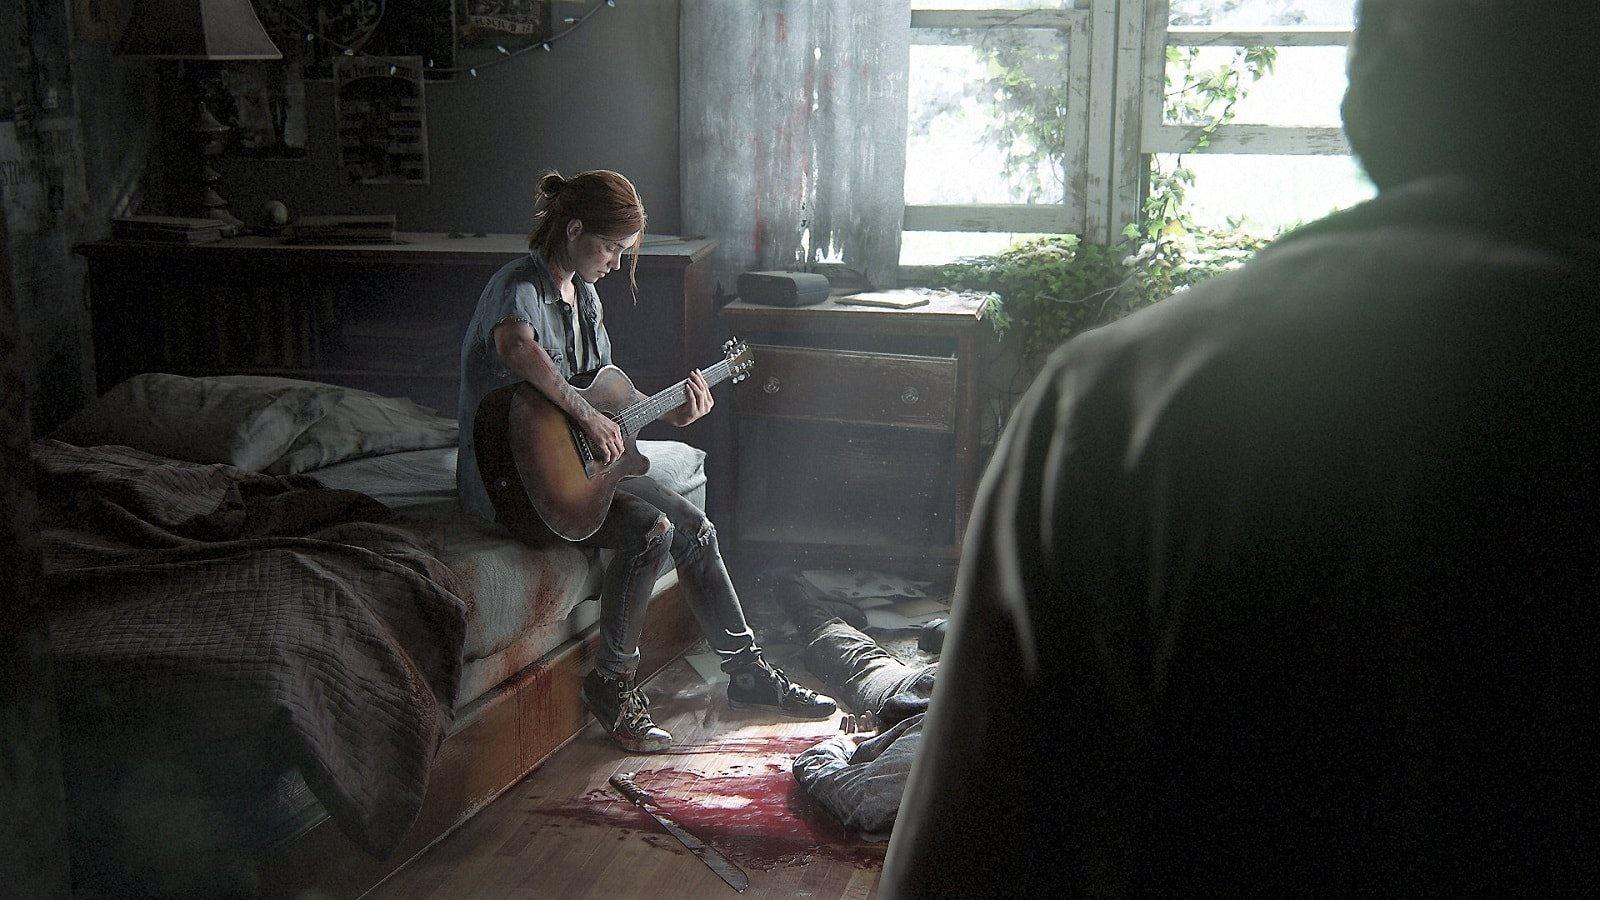 The Last of Us: Part 2; screenshot, Ellie, guitar